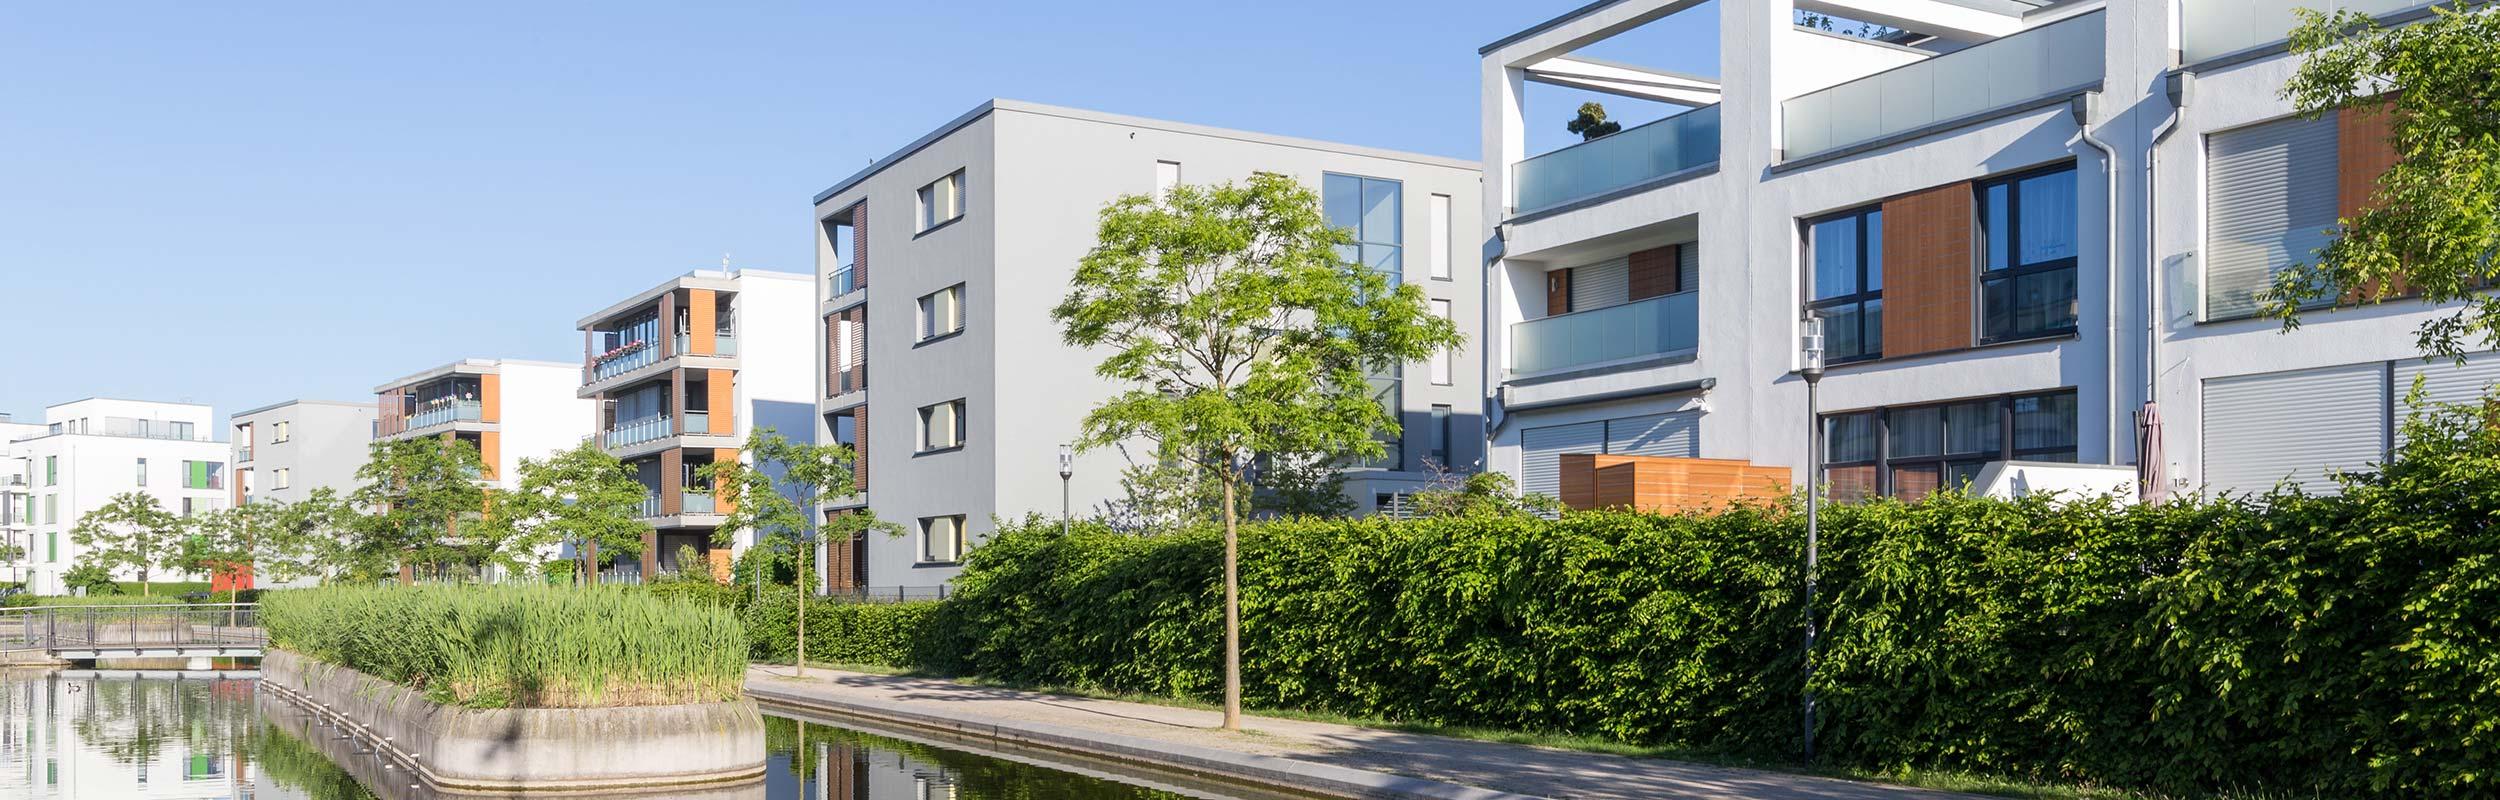 Immobilienmakler Erding; Immobilie verkaufen Erding